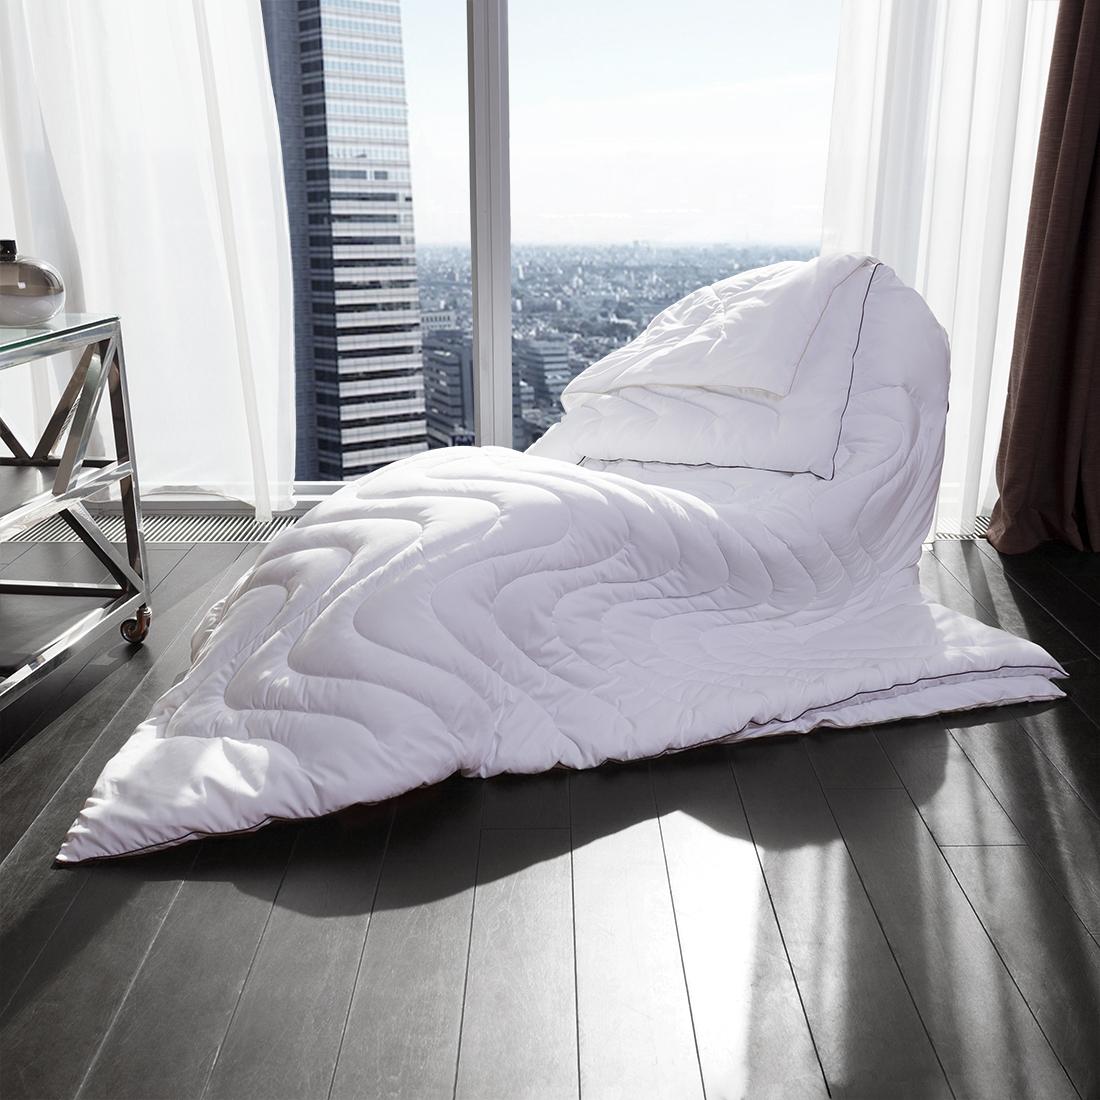 {} Sleep iX Комплект одеял на магнитах 4 Сезона (200х220 см)